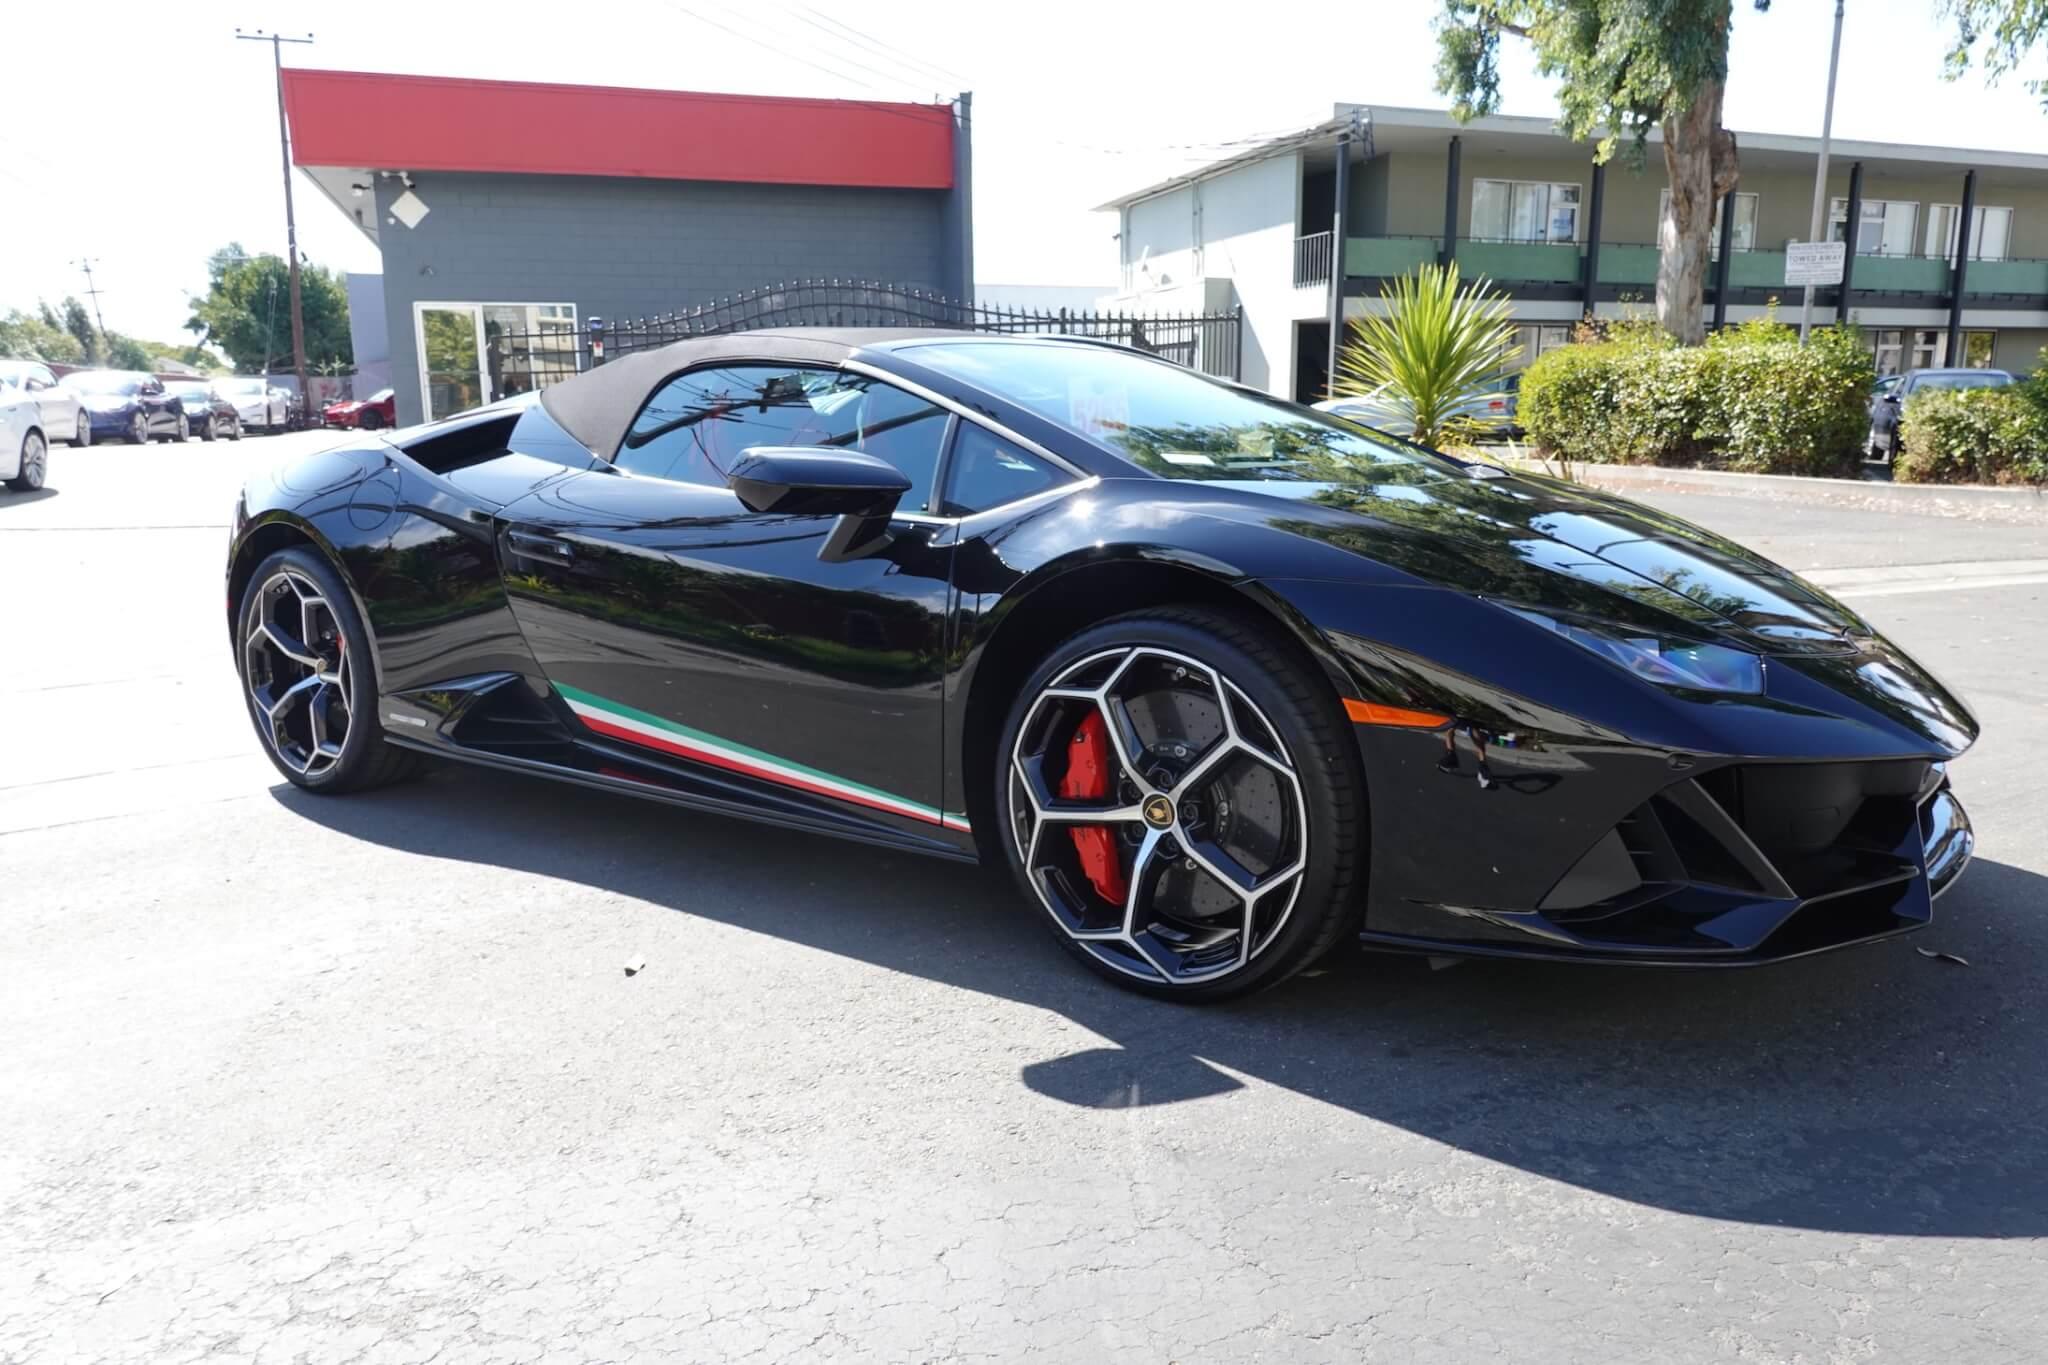 2019 Lamborghini Huracan Performante Spyder Full Stek Dynoshield Paint Protection Film With Cquartz Finest Reserve Ceramic Coating Ocdetailing